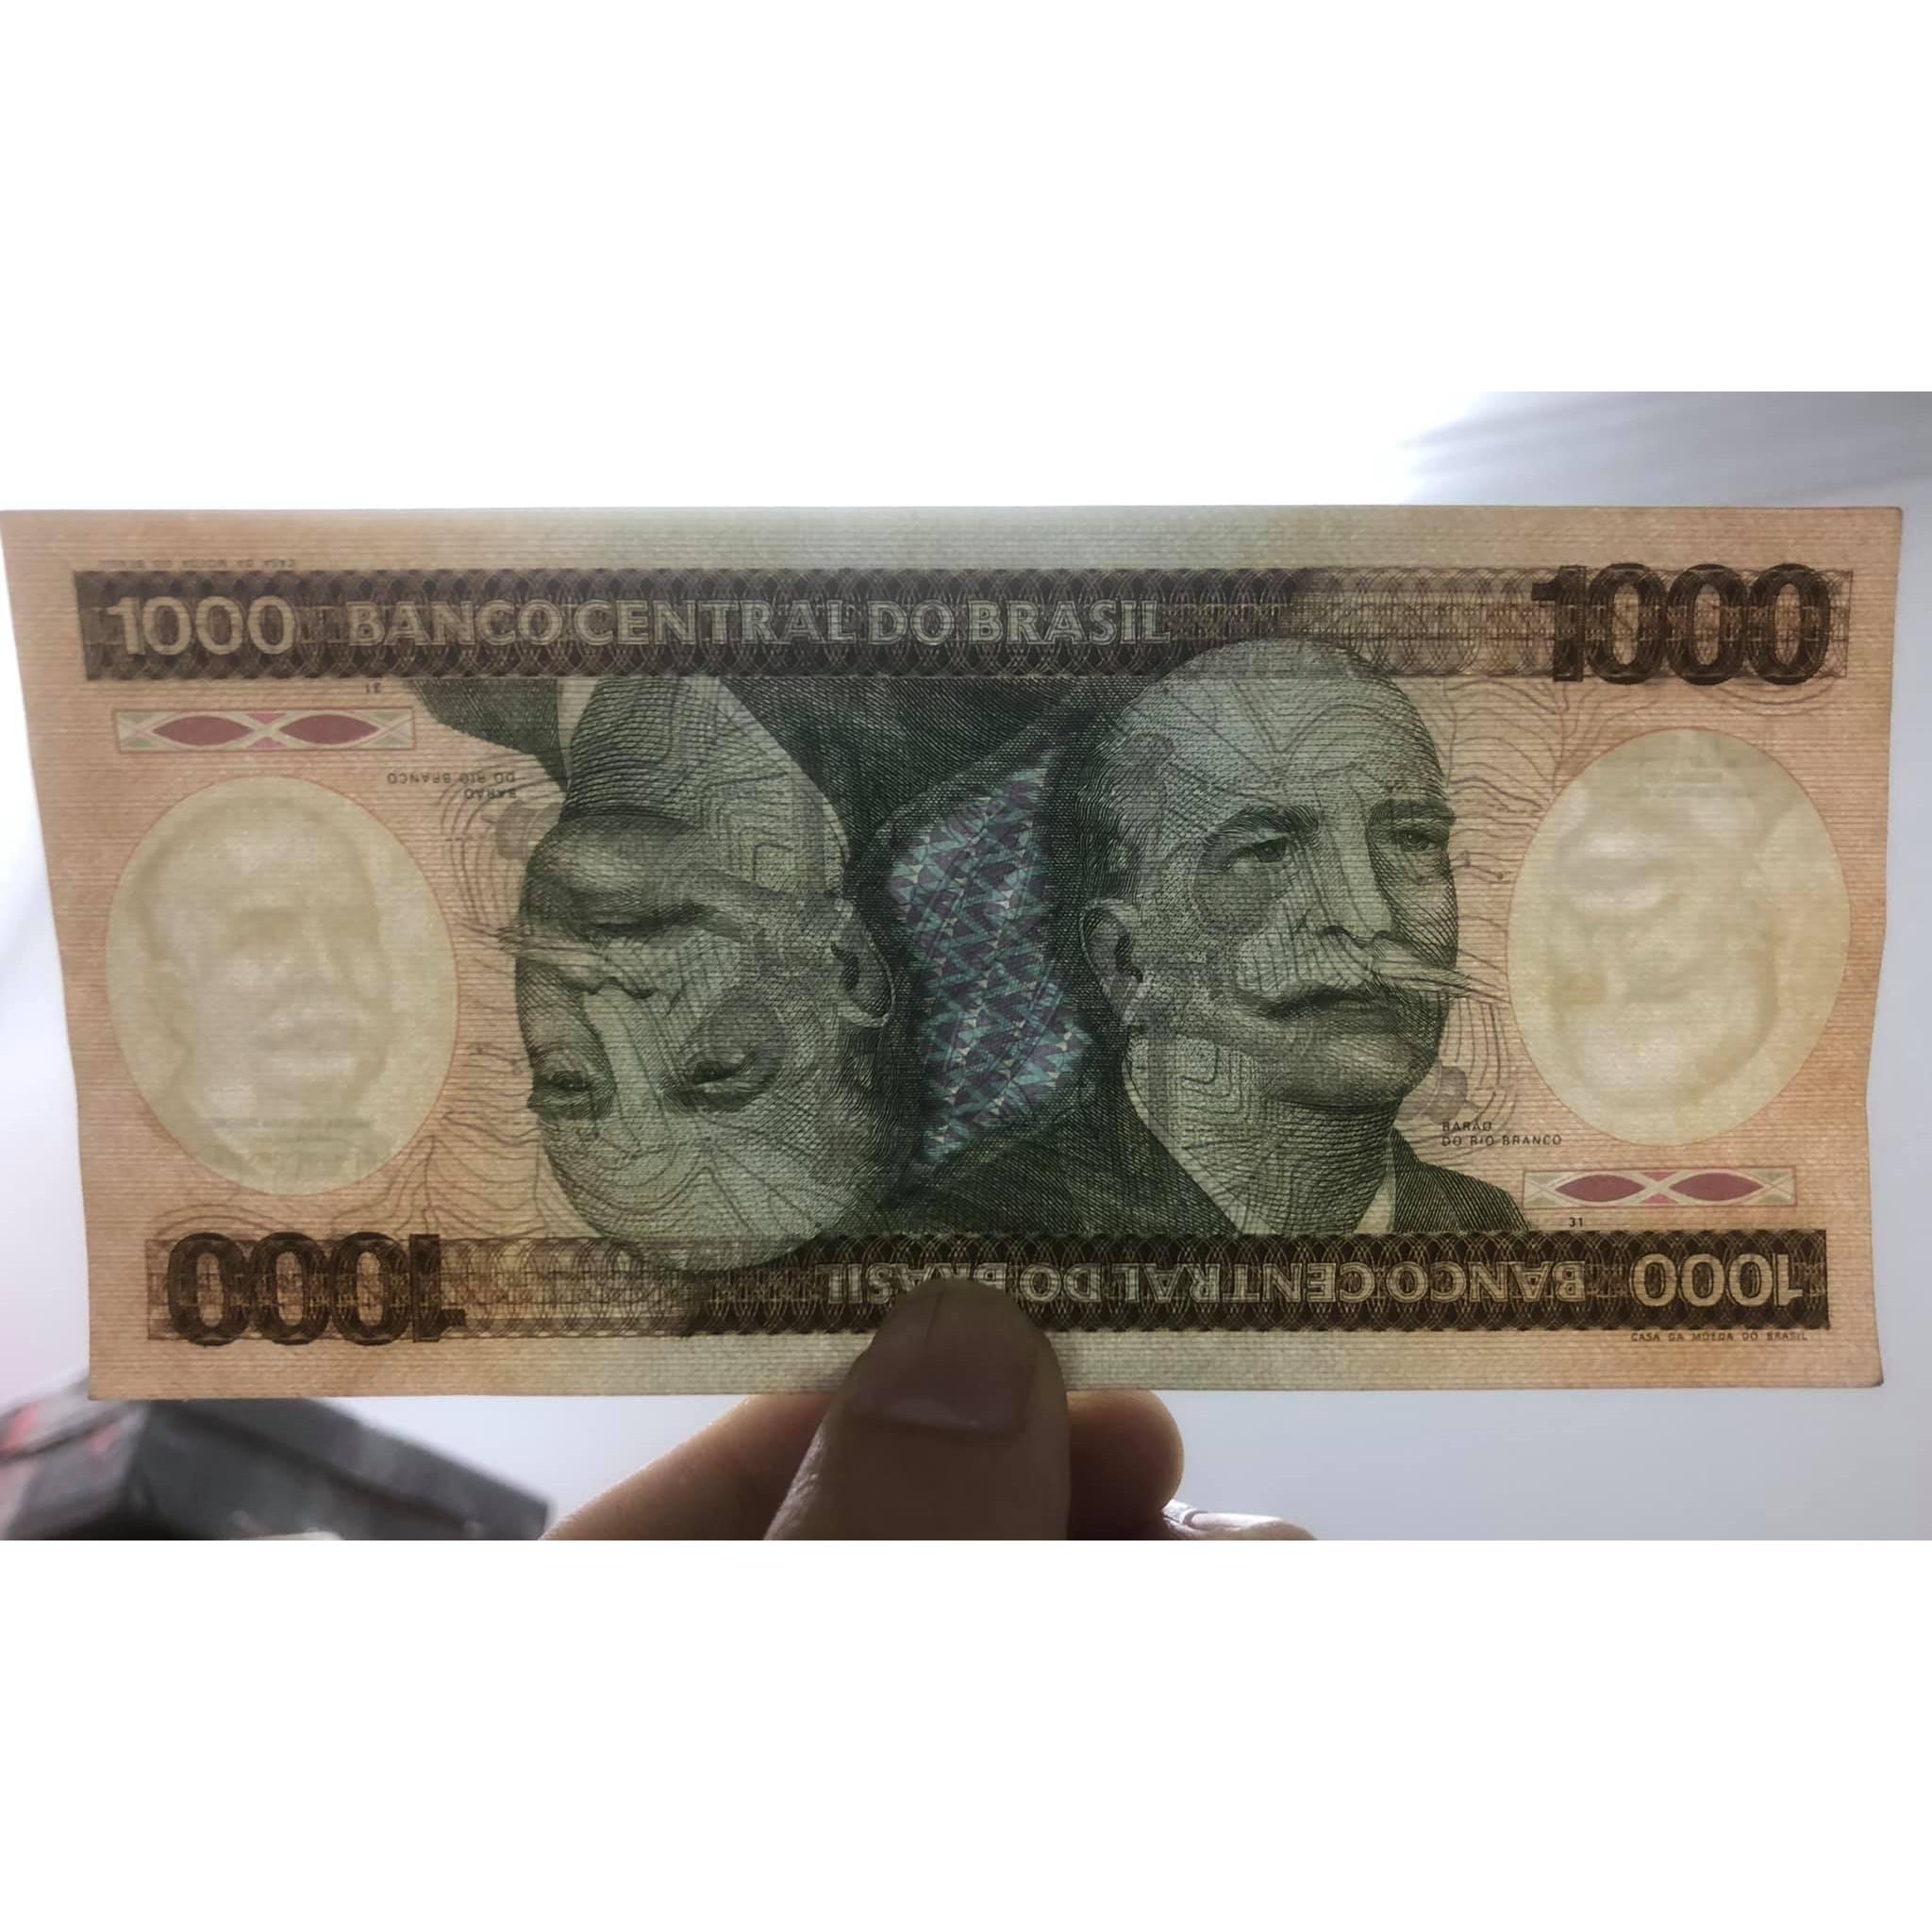 Tờ tiền cổ 1000 Cruzeiros của Brazil sưu tầm